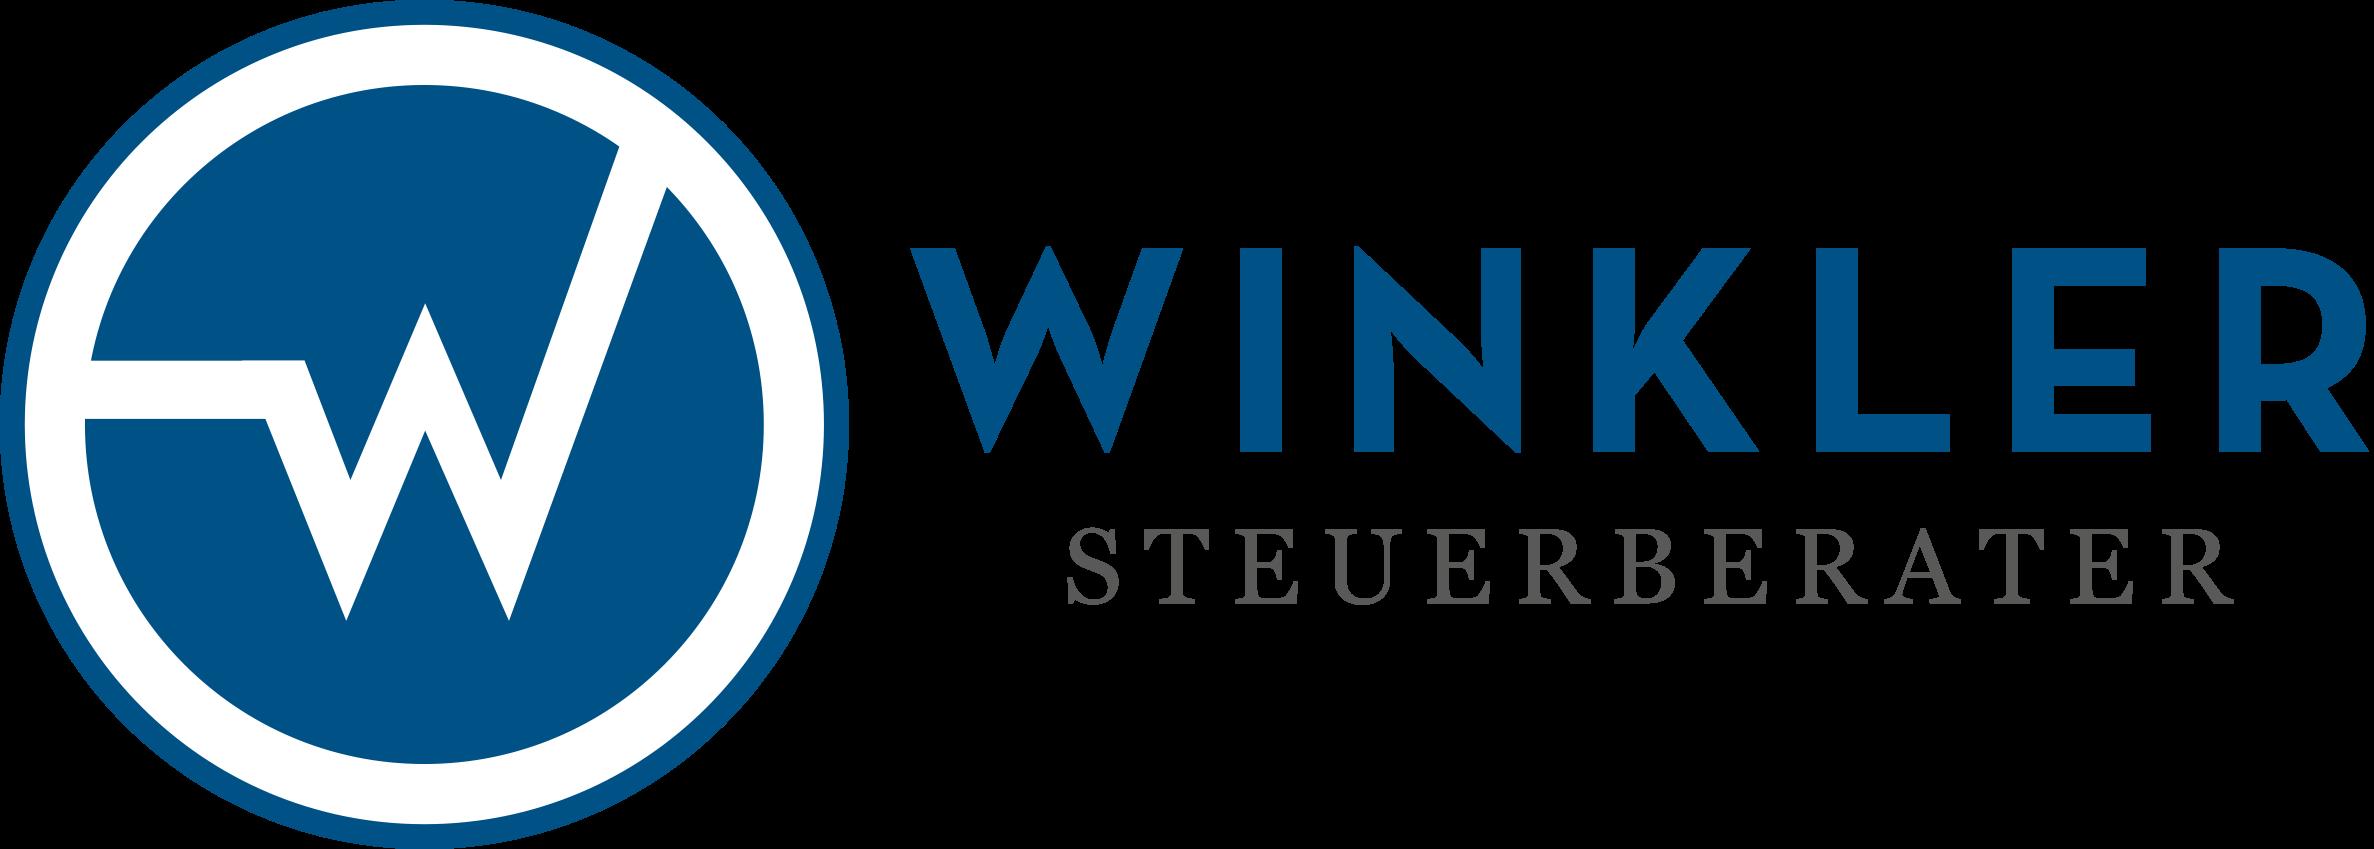 Benedikt Winkler Steuerberater Köln Logo